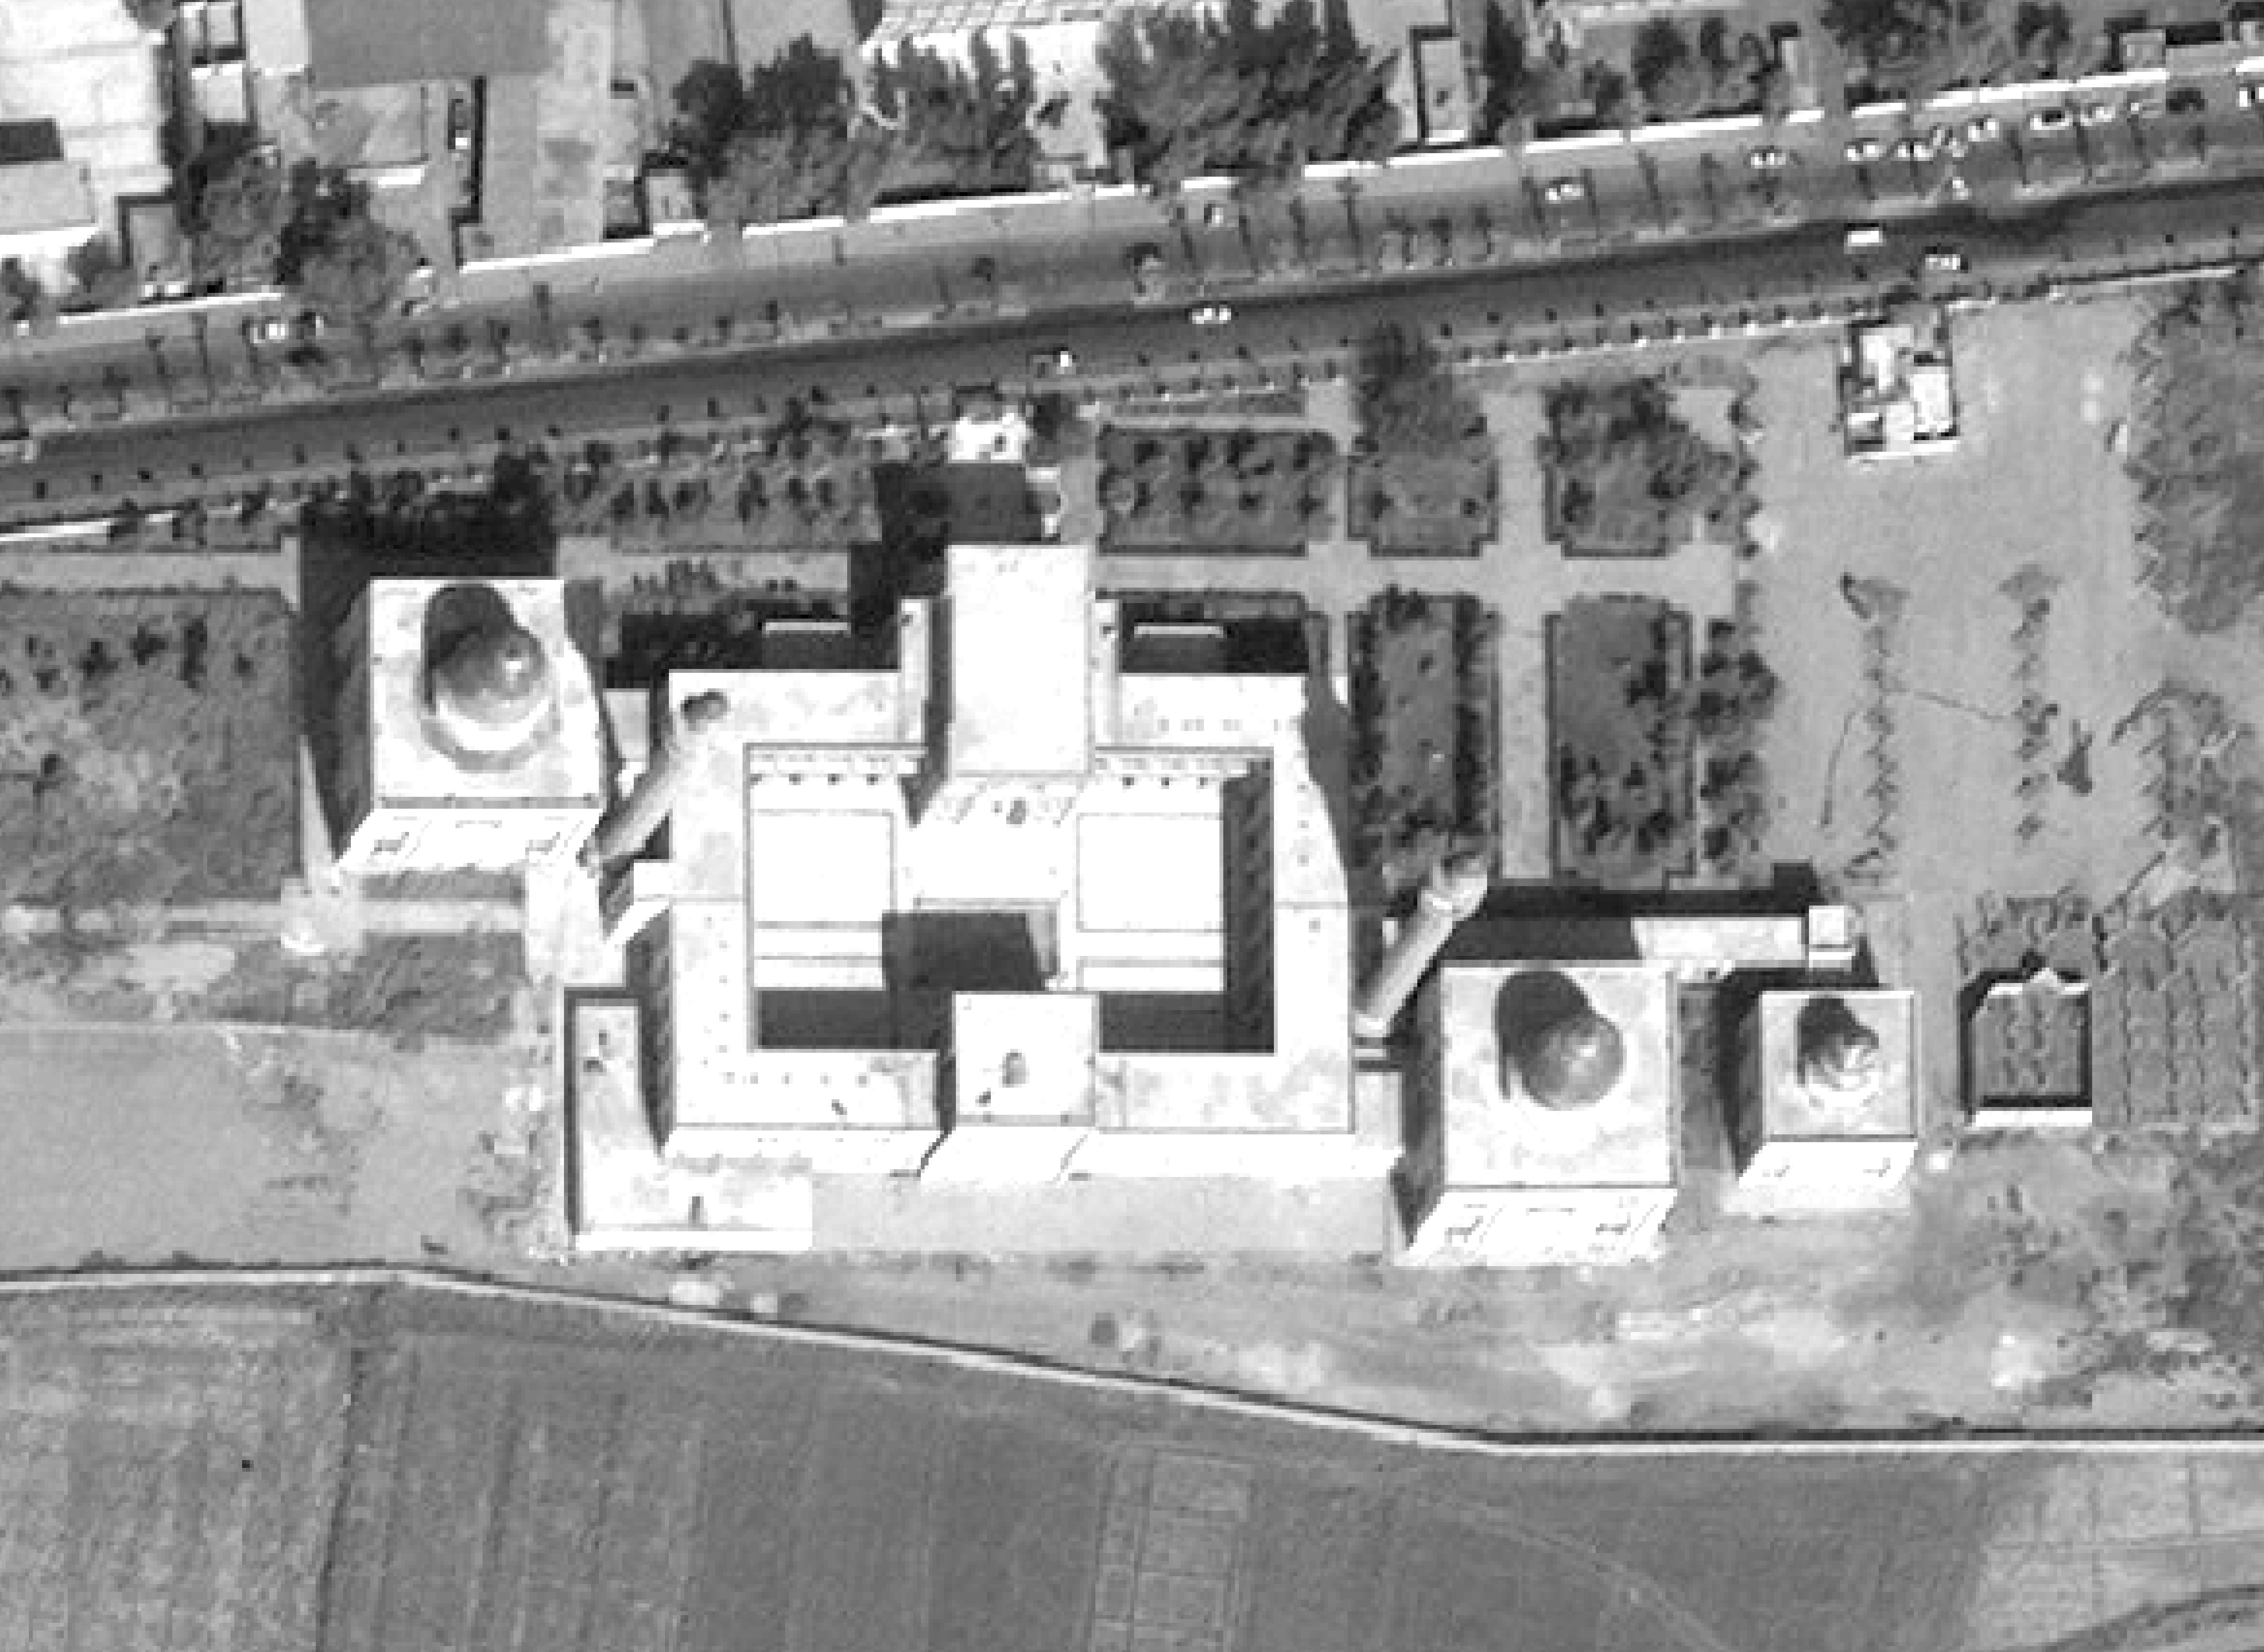 Shrine Uwais Ammar, Raqqa